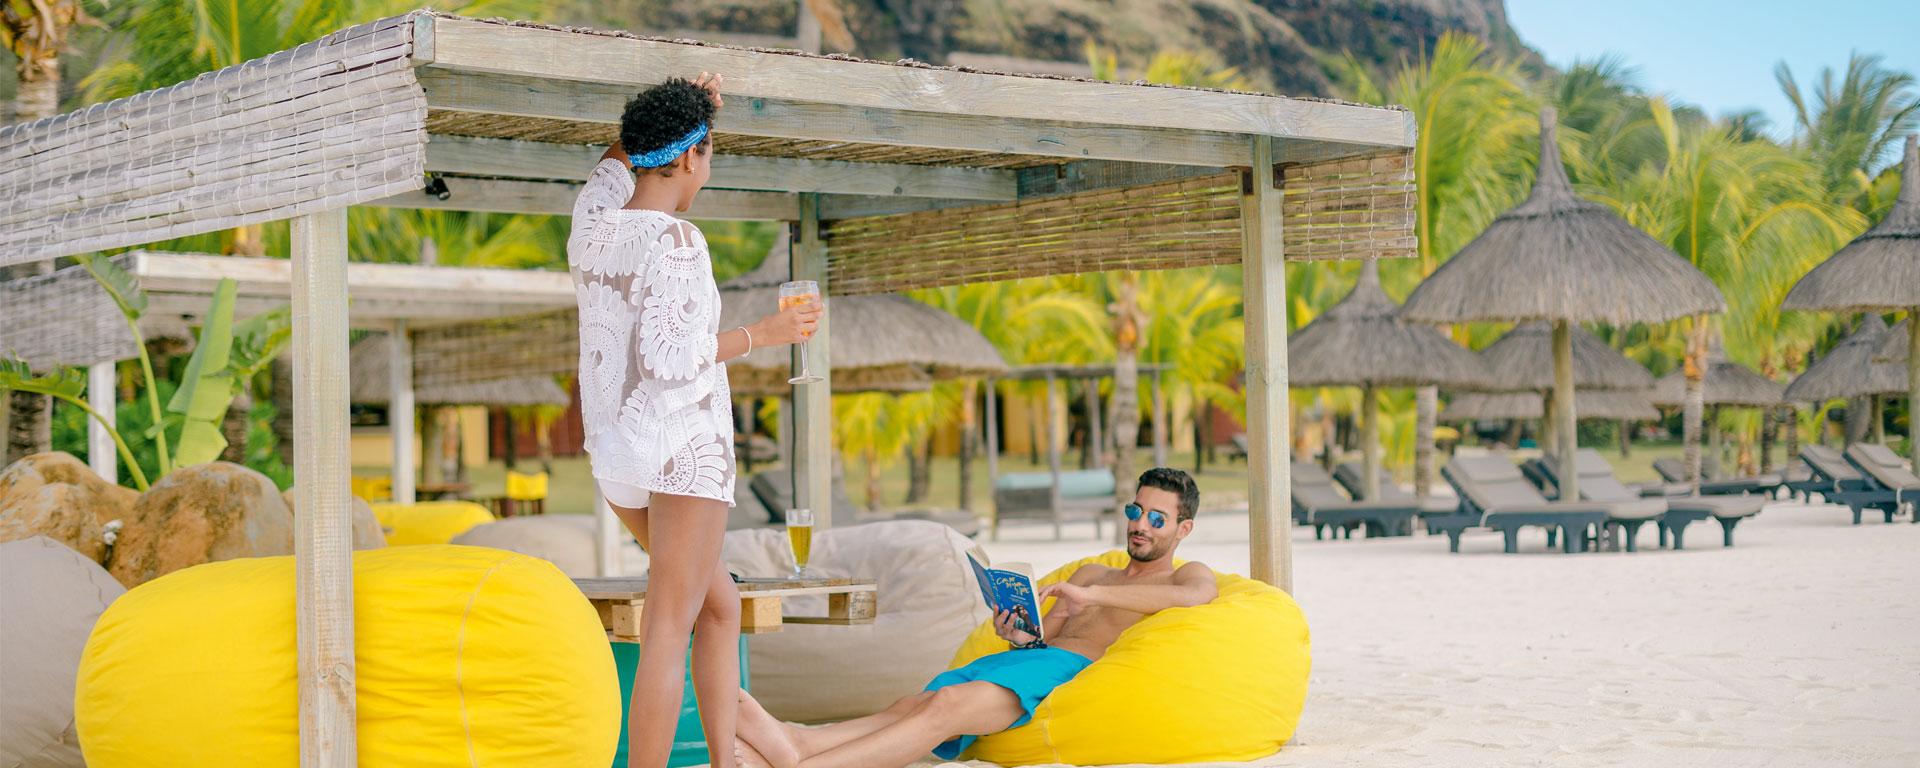 beachcomber honeymoon offer